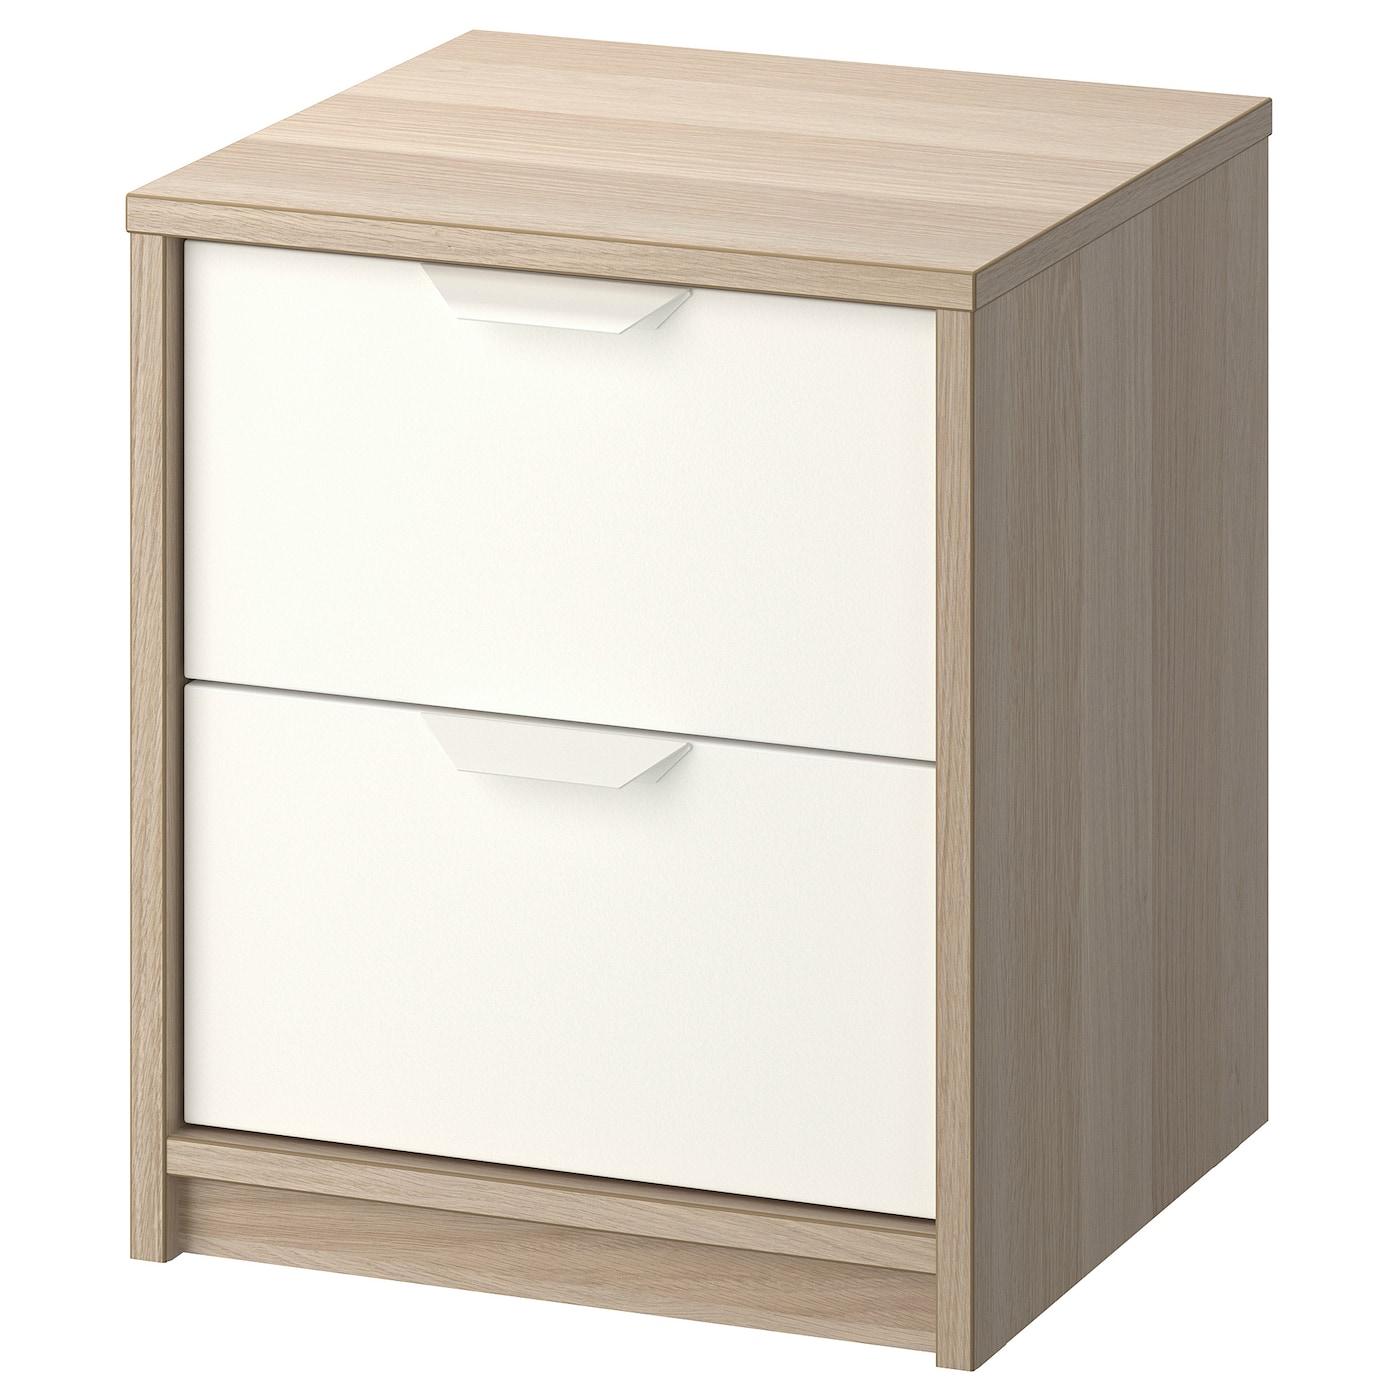 askvoll commode 2 tiroirs effet ch ne blanchi blanc 41 x 48 cm ikea. Black Bedroom Furniture Sets. Home Design Ideas